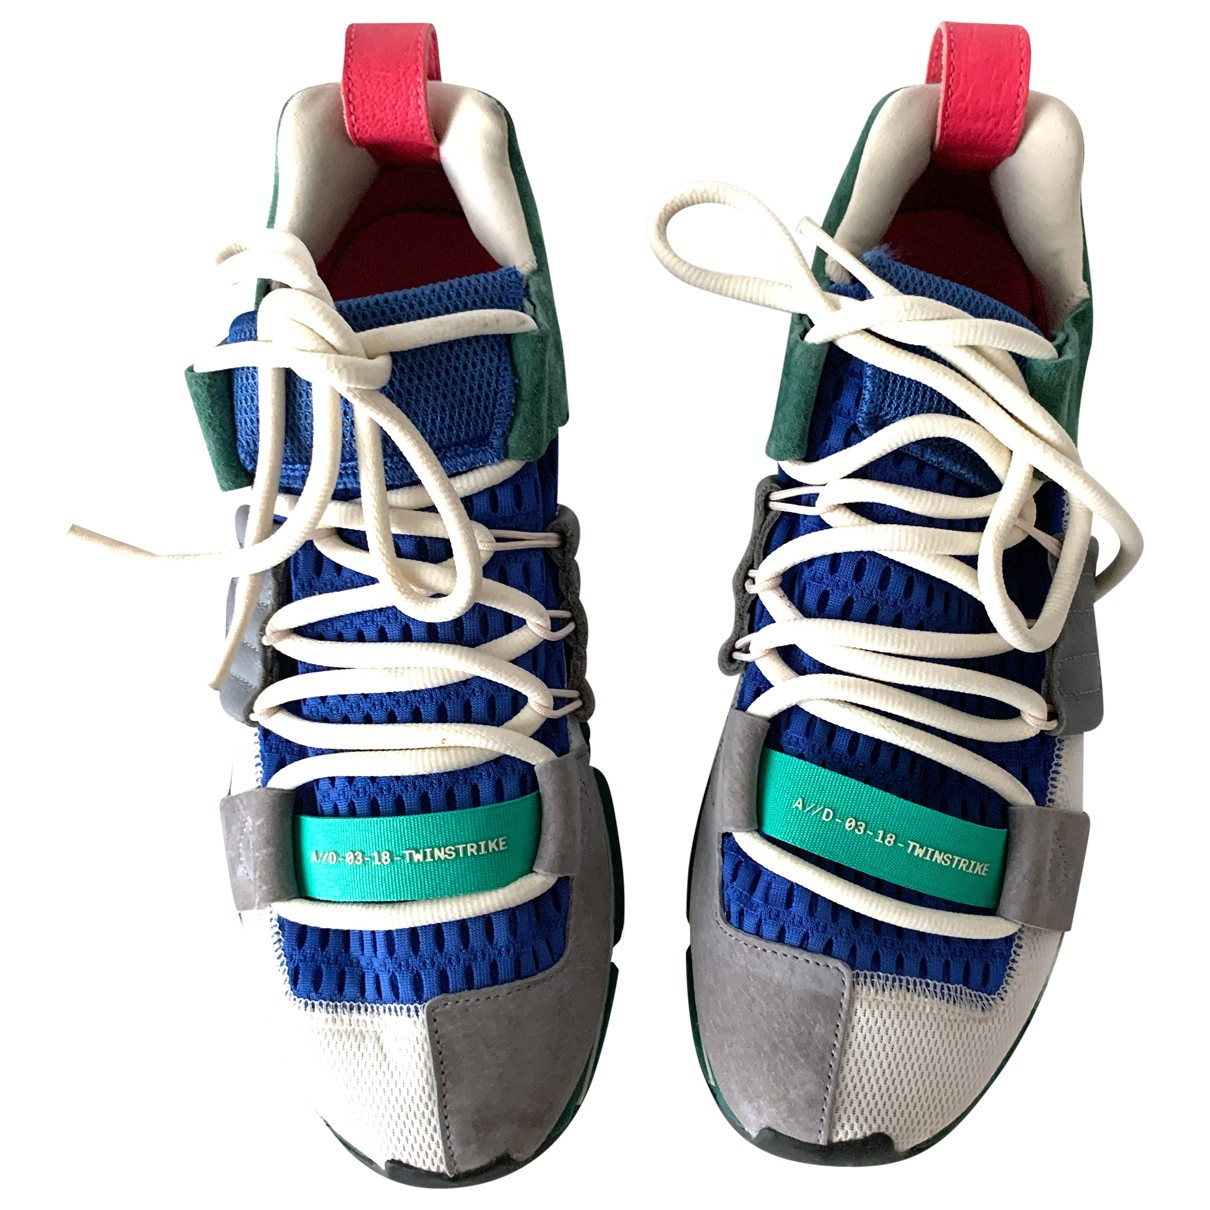 Adidas Twinstrike Sneakers in  Bunt Kautschuk